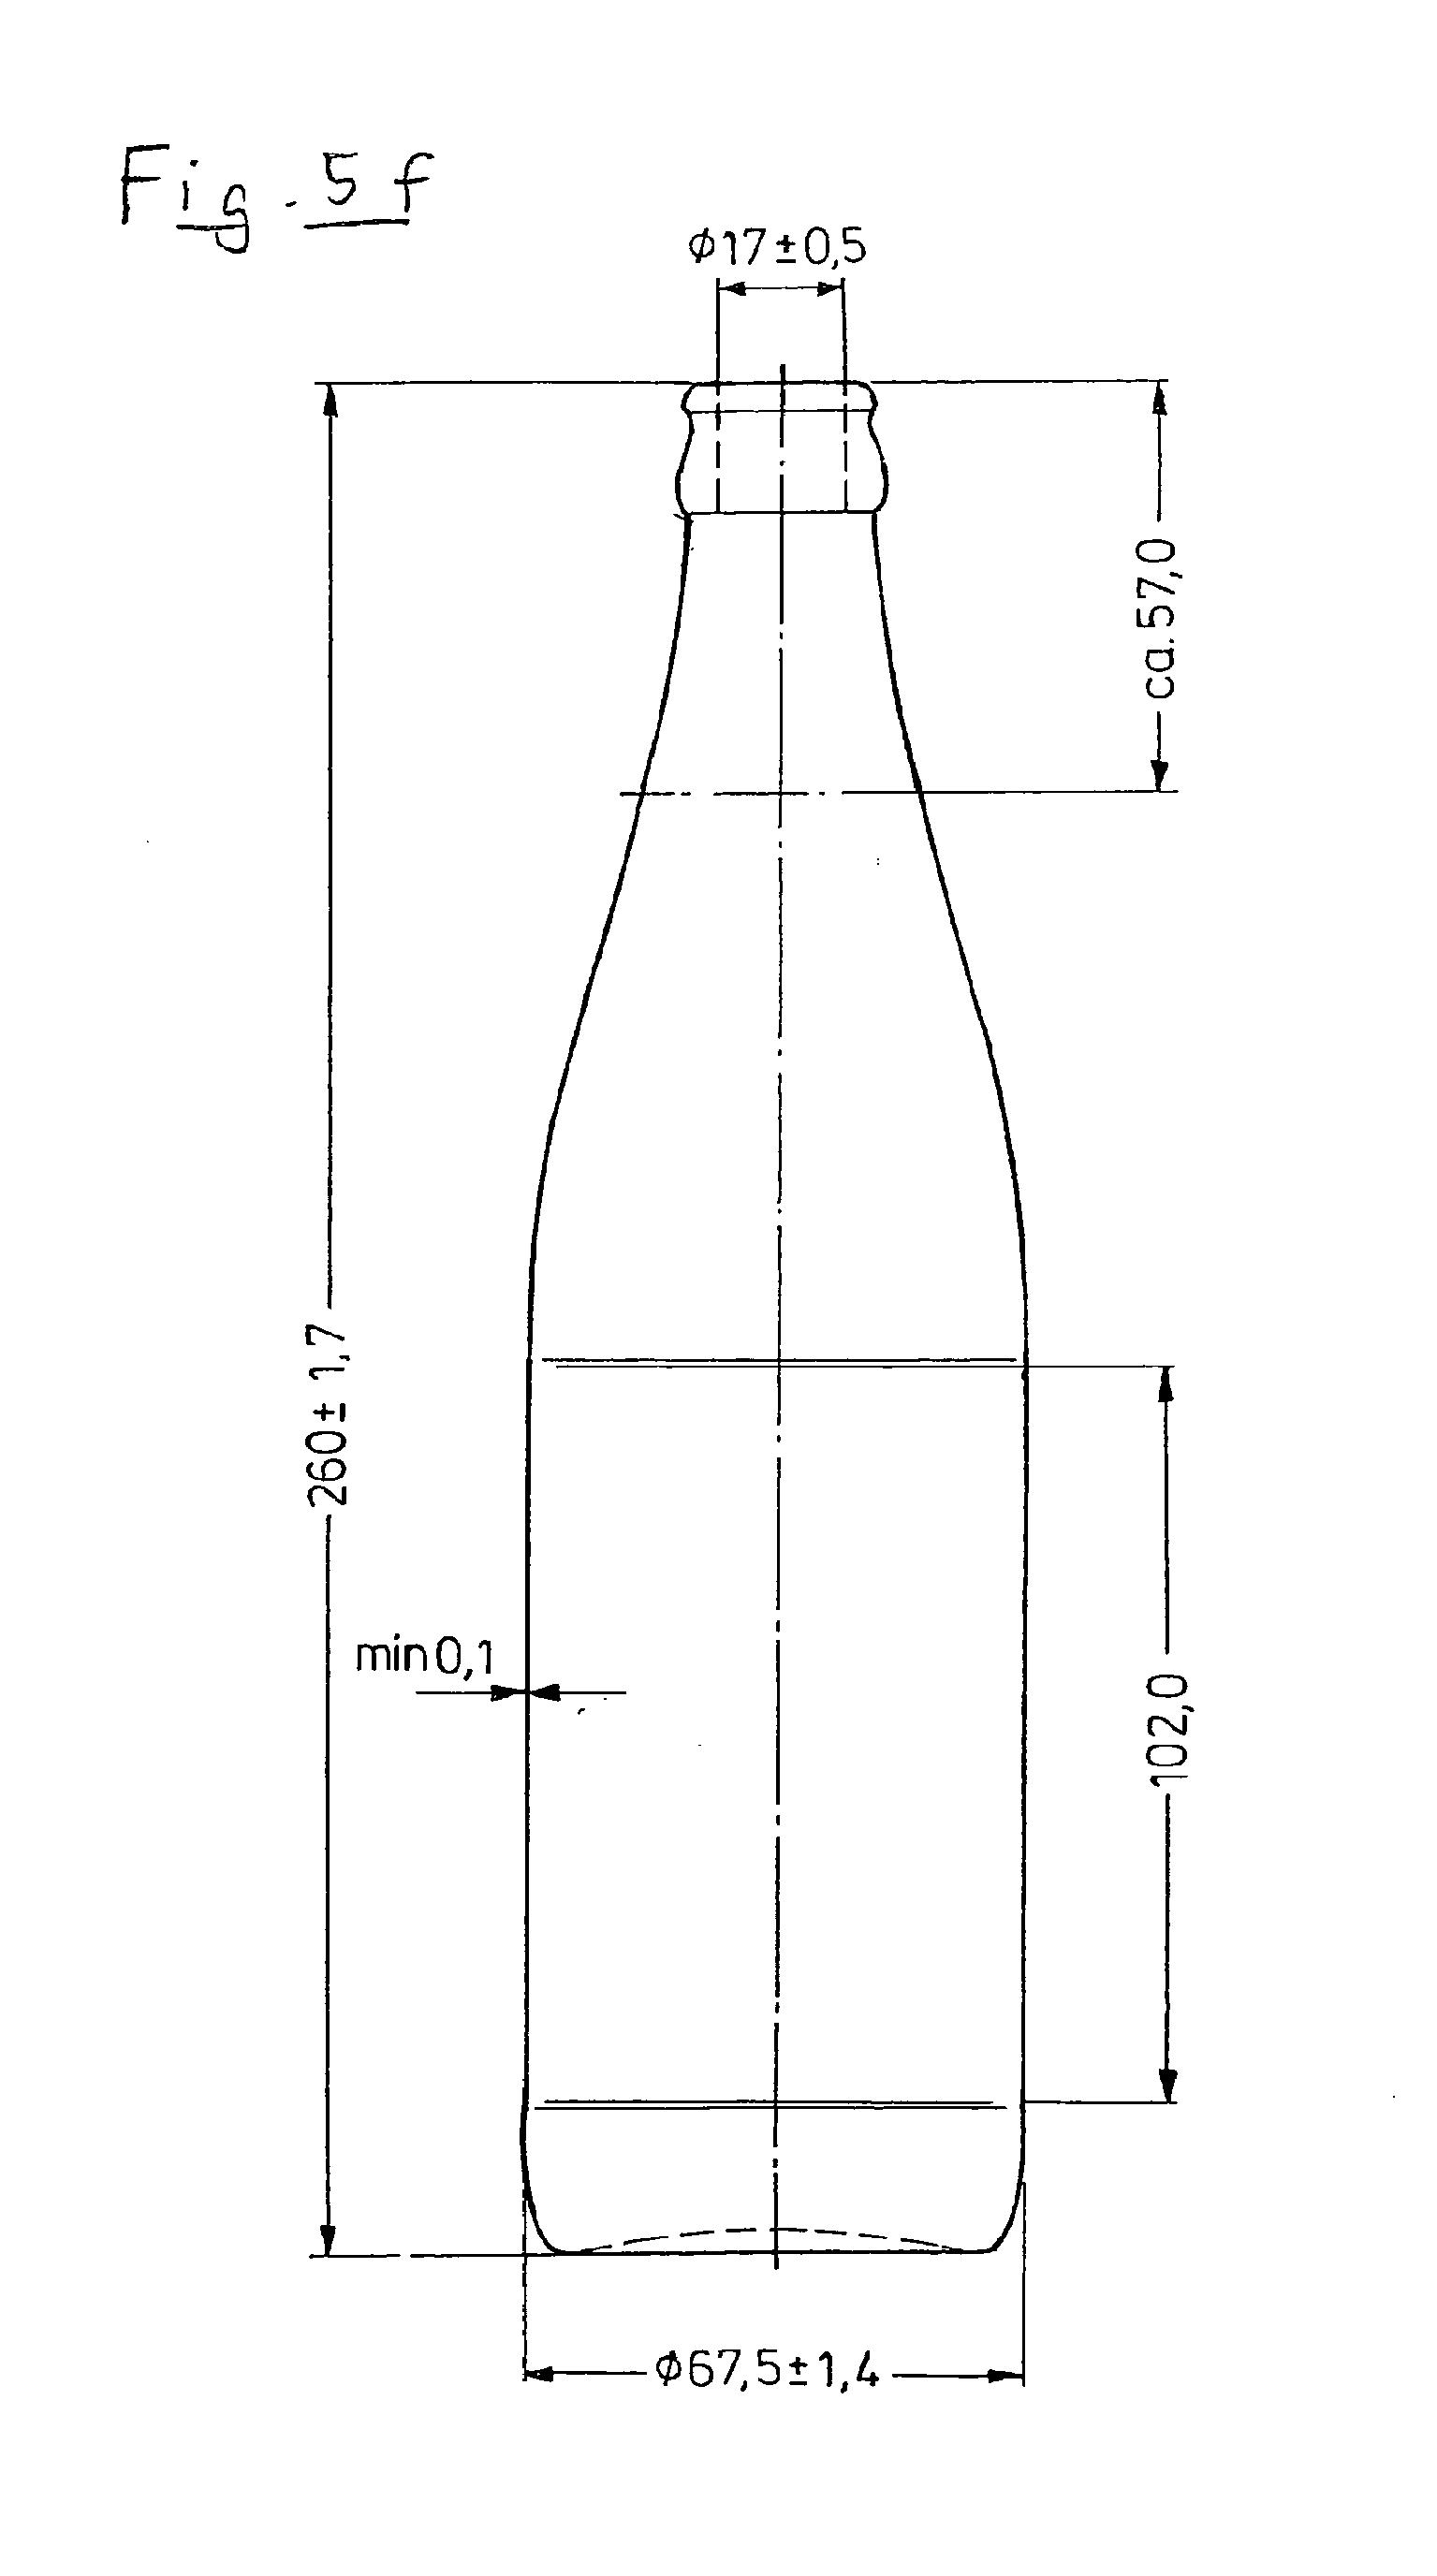 patent ep2530024a1 ladungstr ger google patents. Black Bedroom Furniture Sets. Home Design Ideas